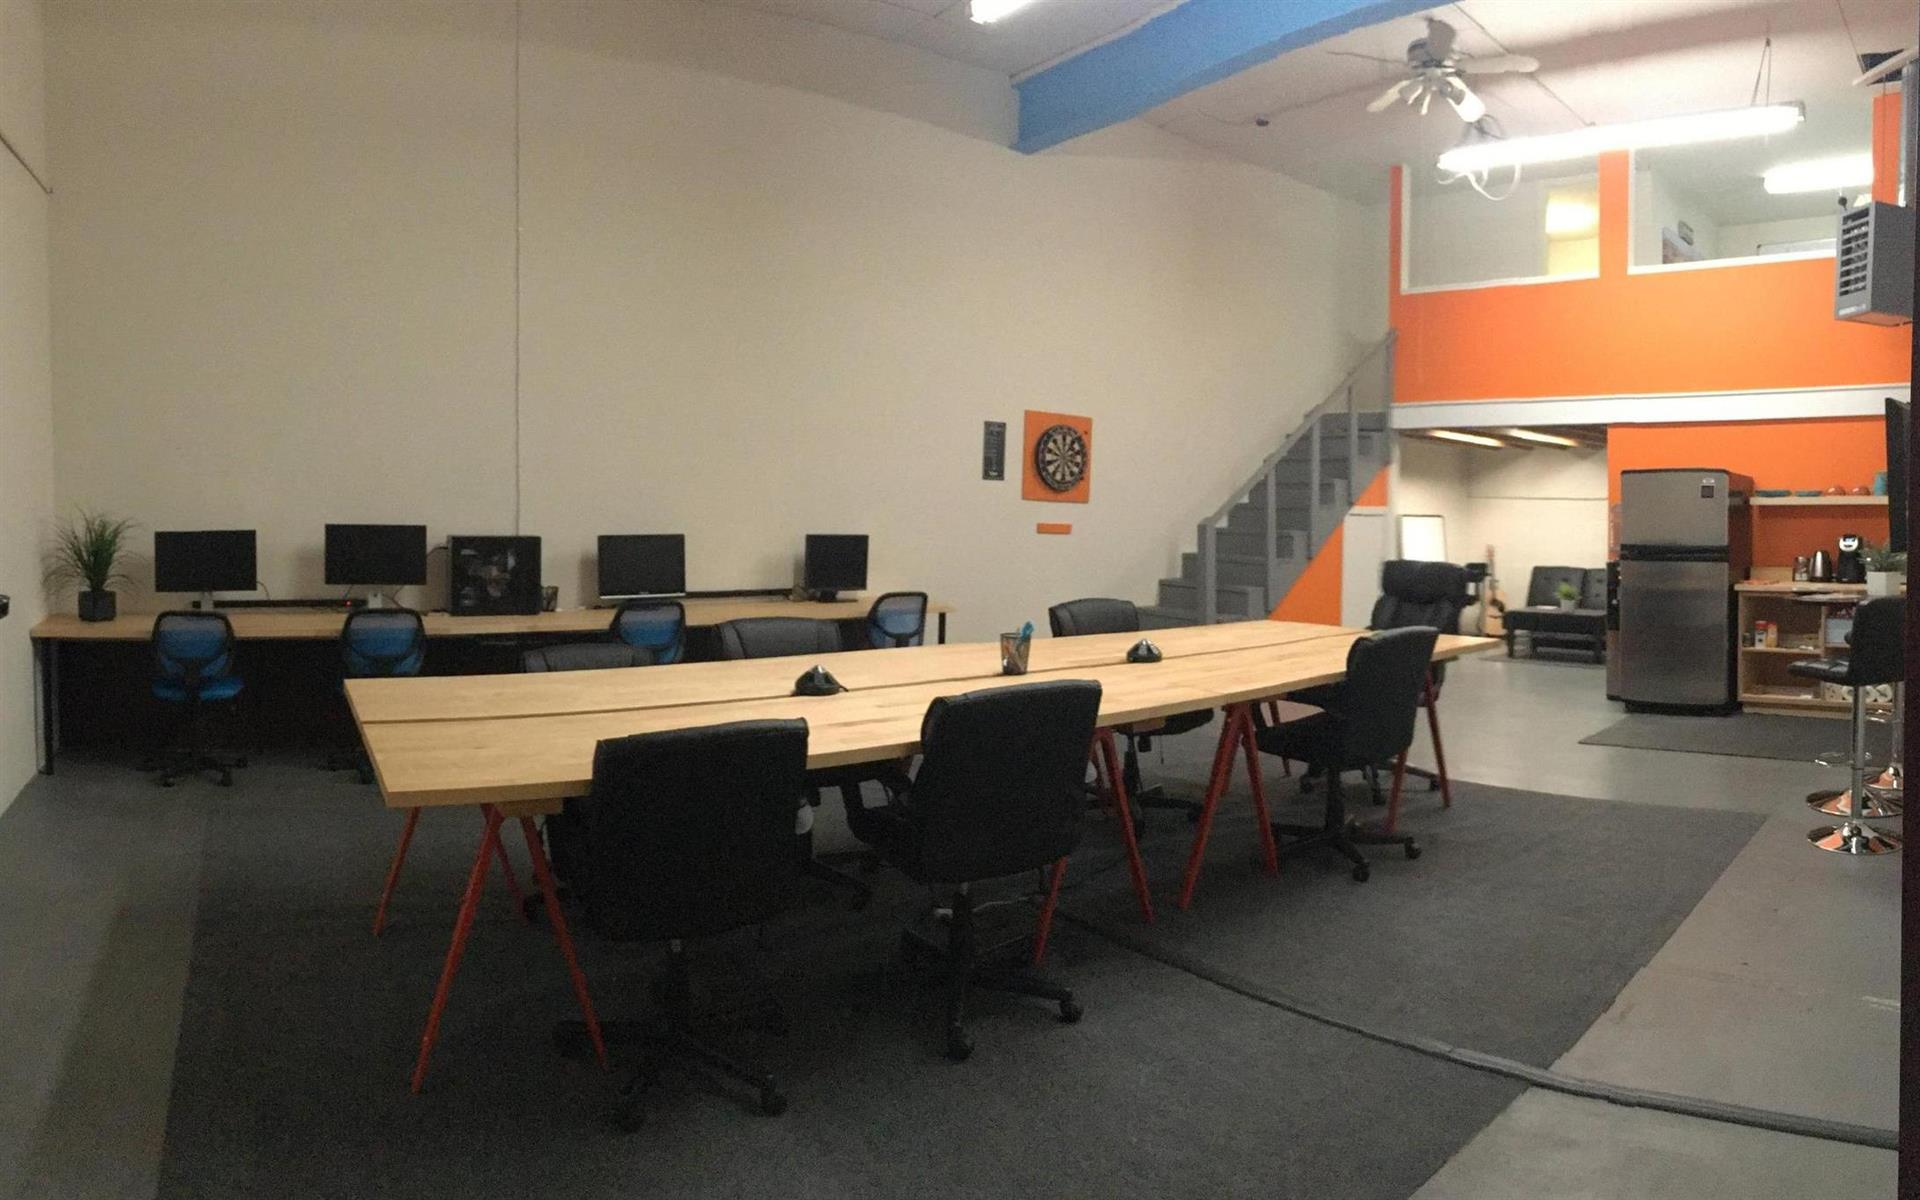 The Yard Shared Workspace - The Yard - 1st Floor